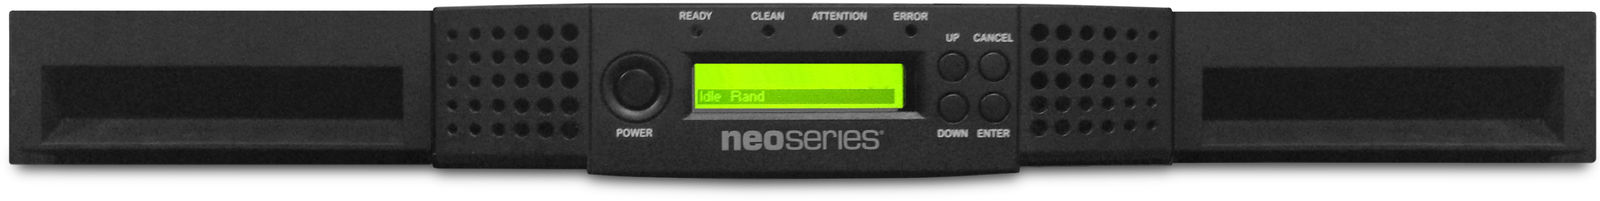 NEOs StorageLoader 1U 8 Slot LTO7 SAS Inc. 3Yr Warr